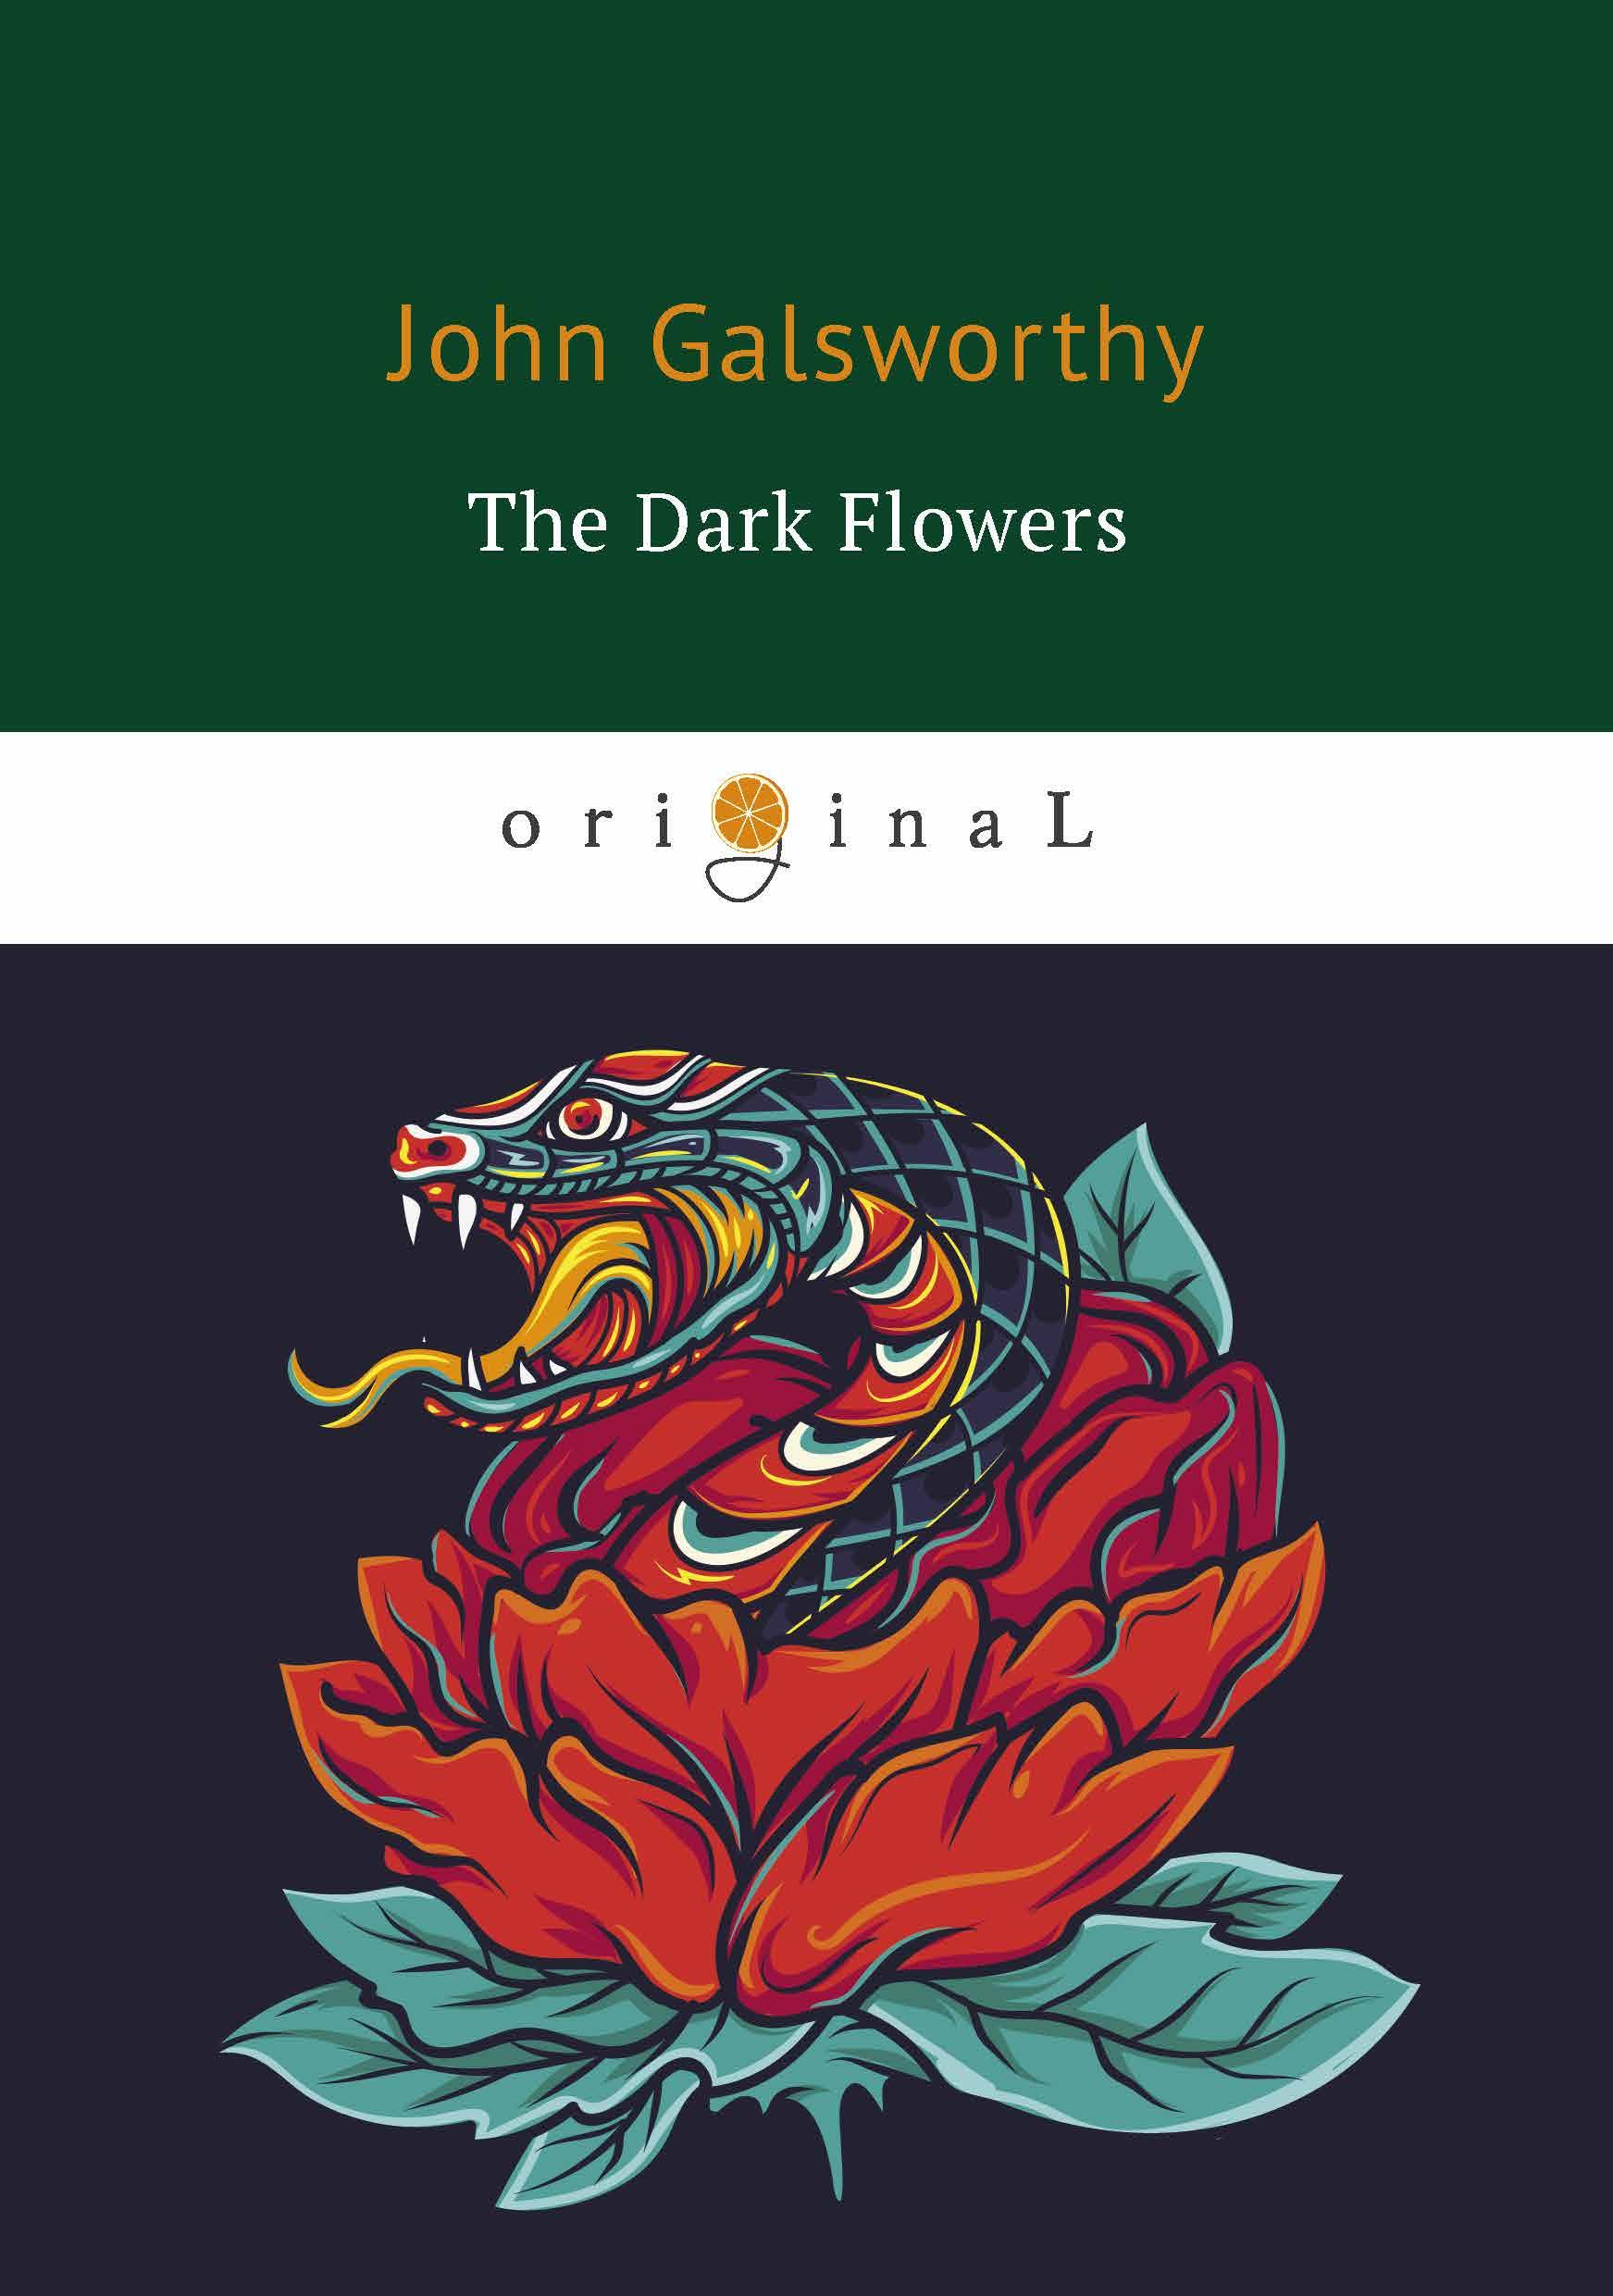 John Galsworthy The Dark Flowers the residents the residents present tweedles